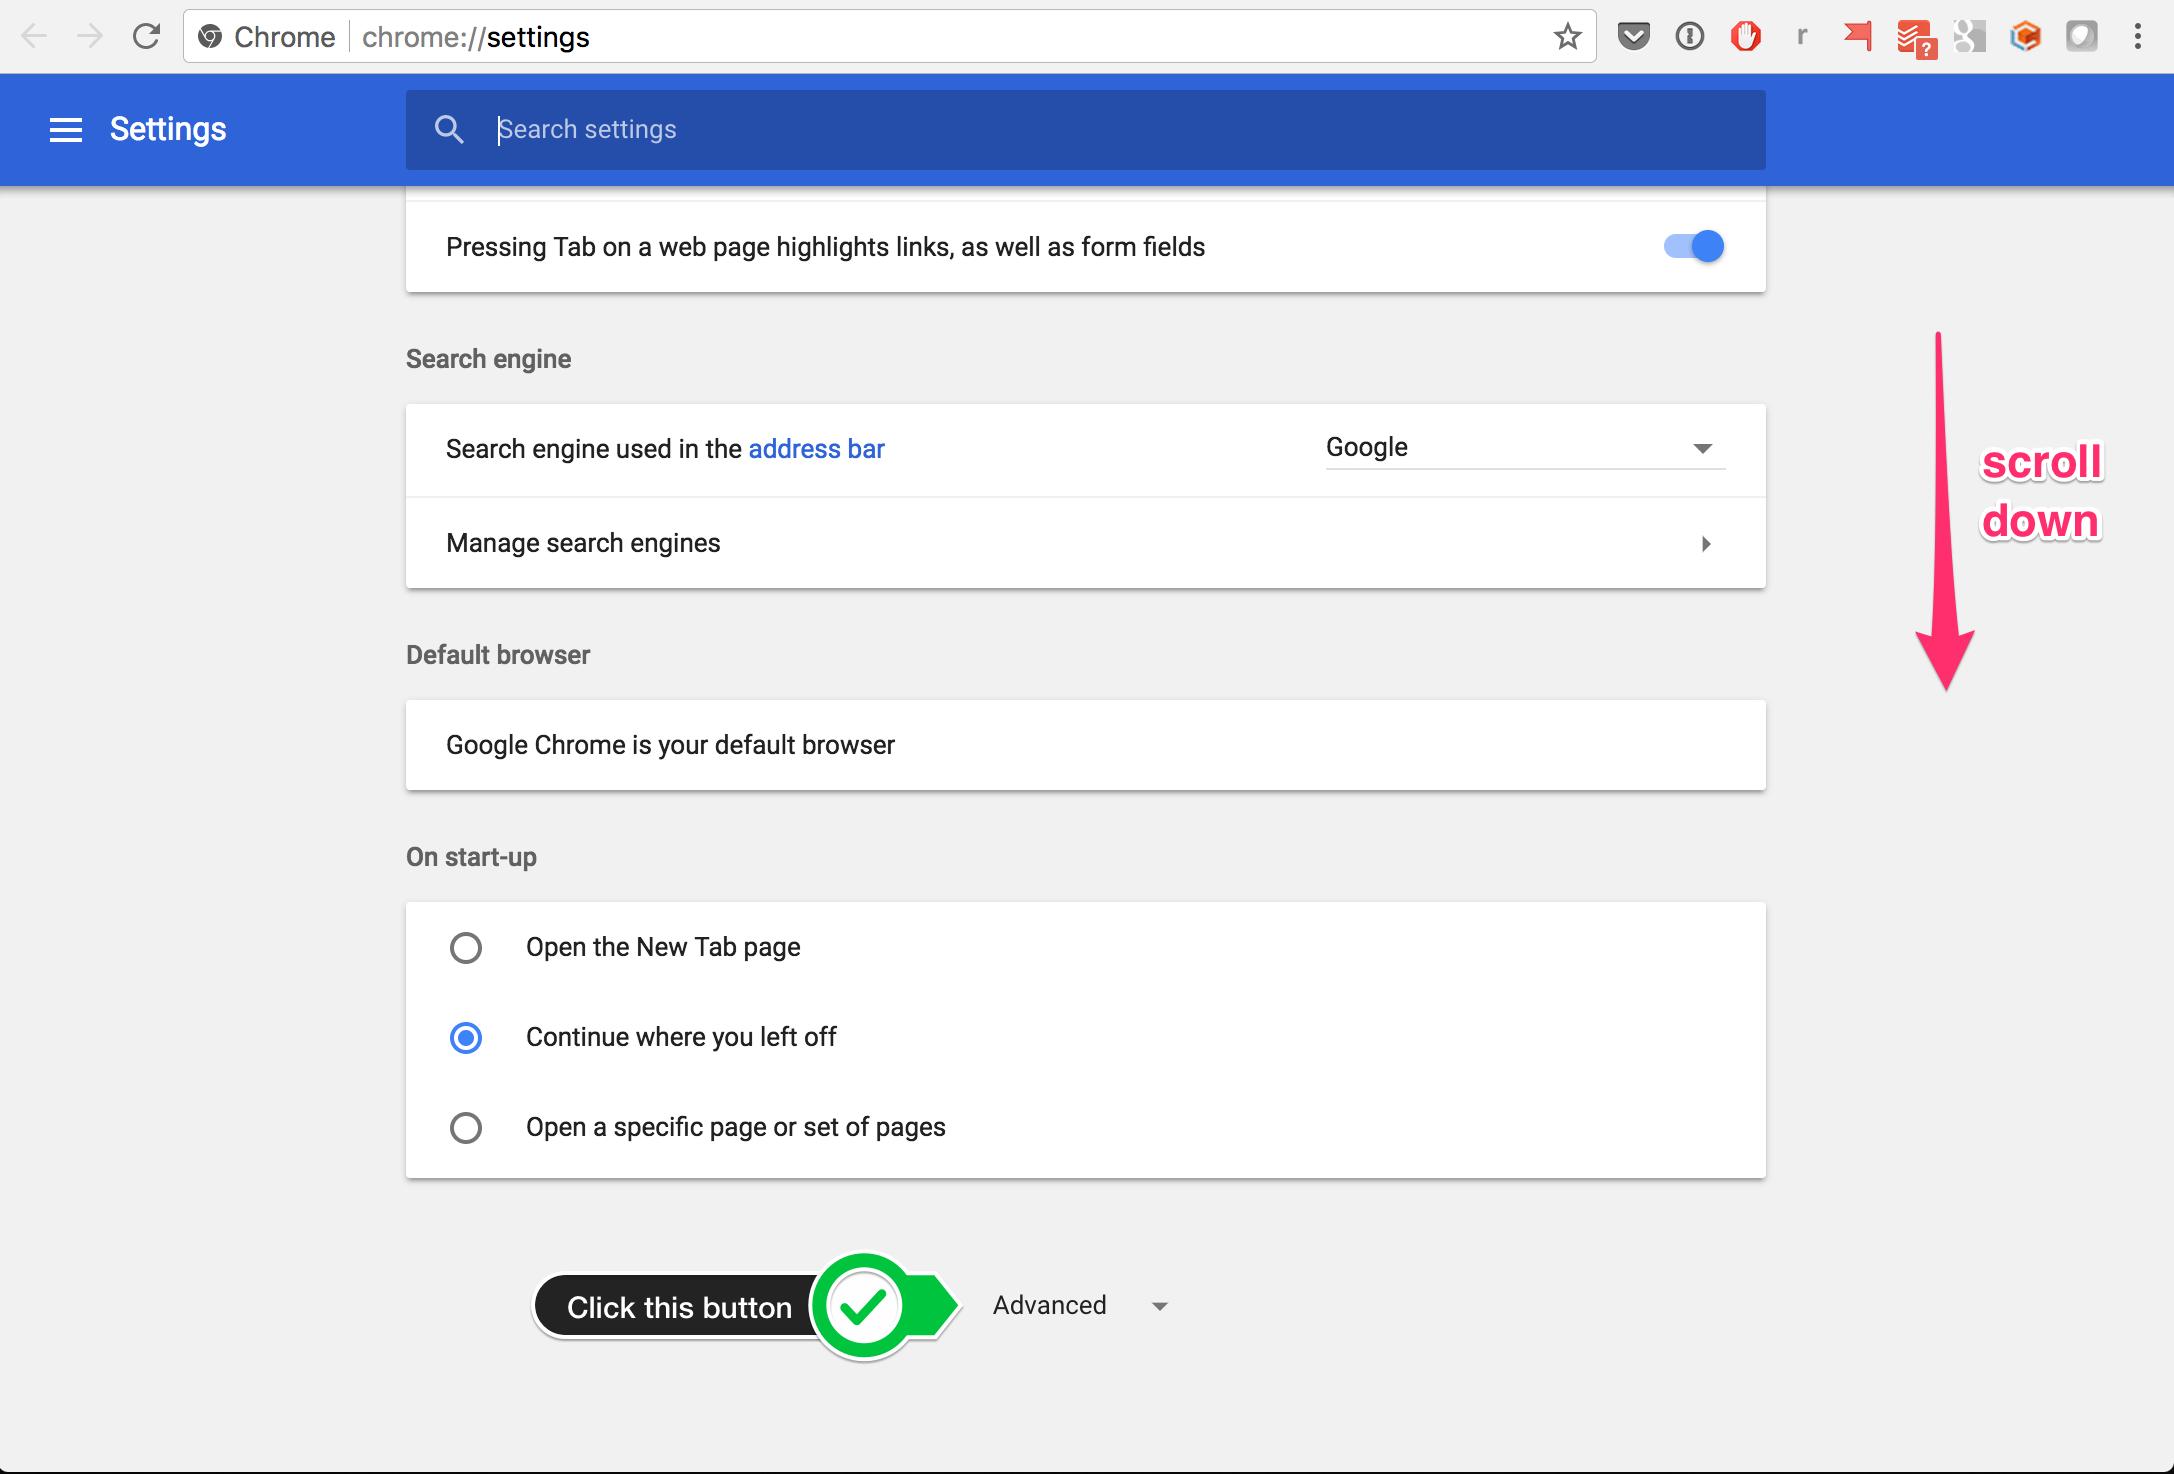 Chrome-settings.png